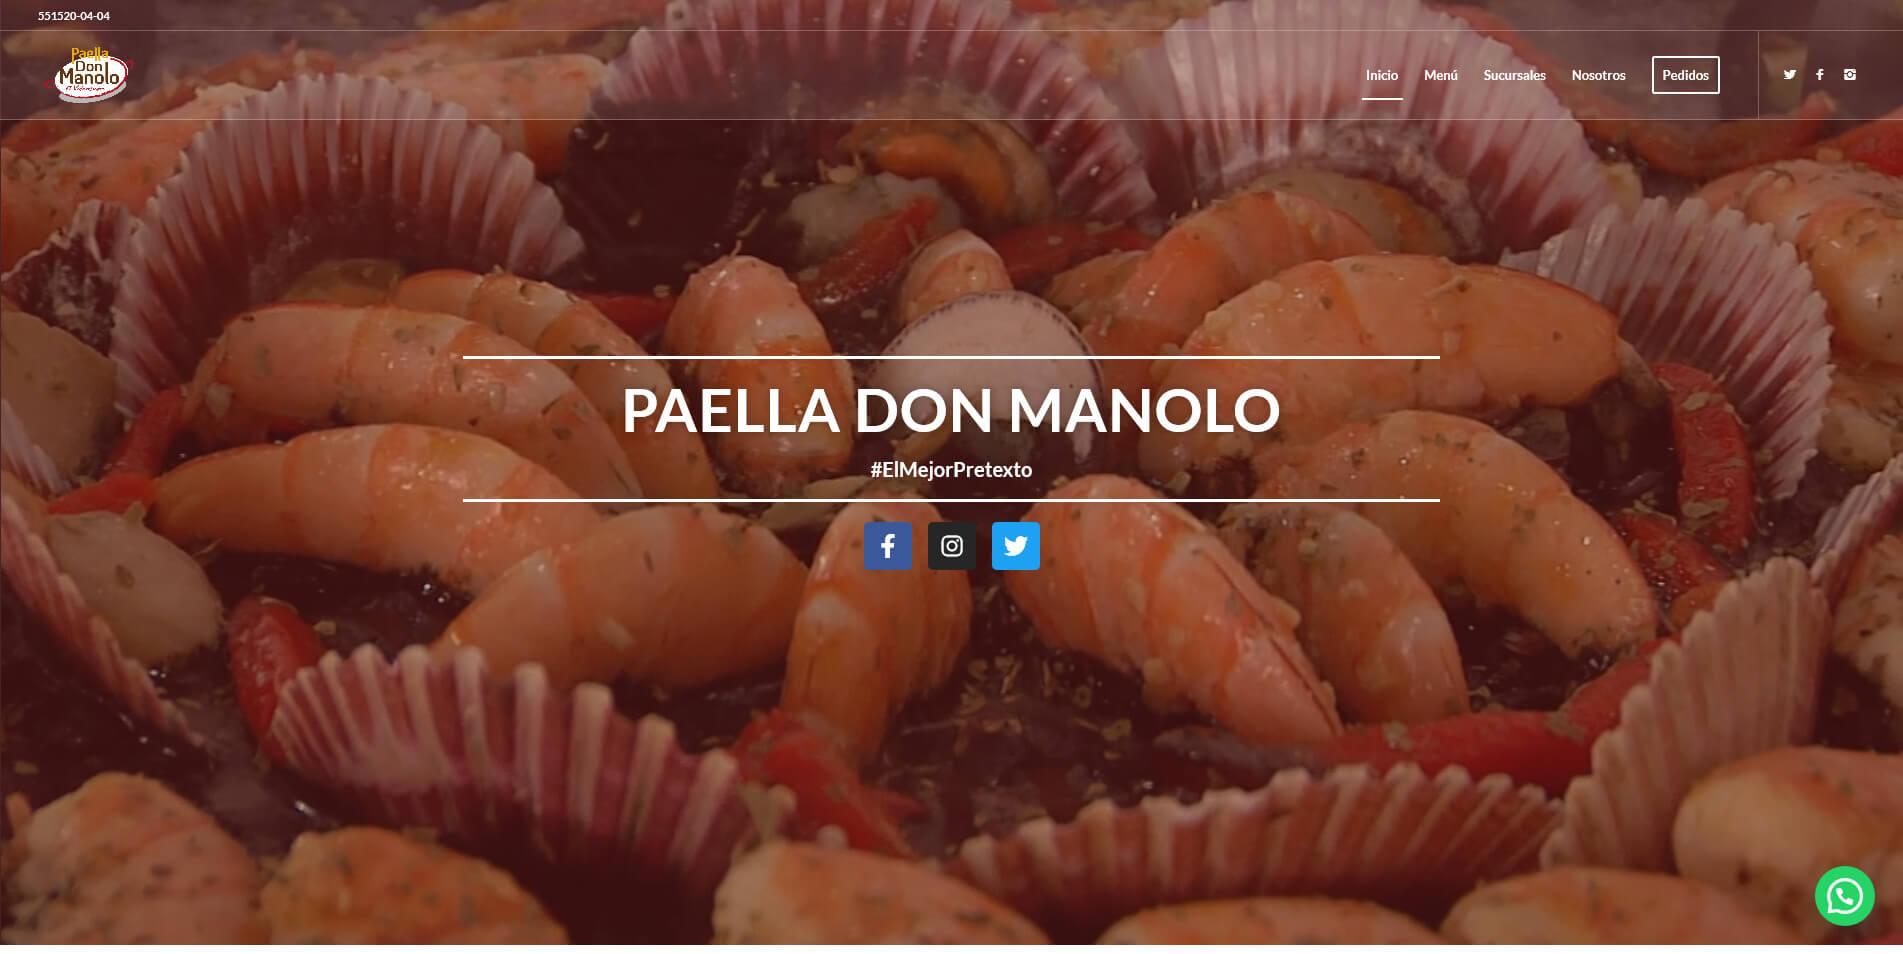 Paella Don Manolo